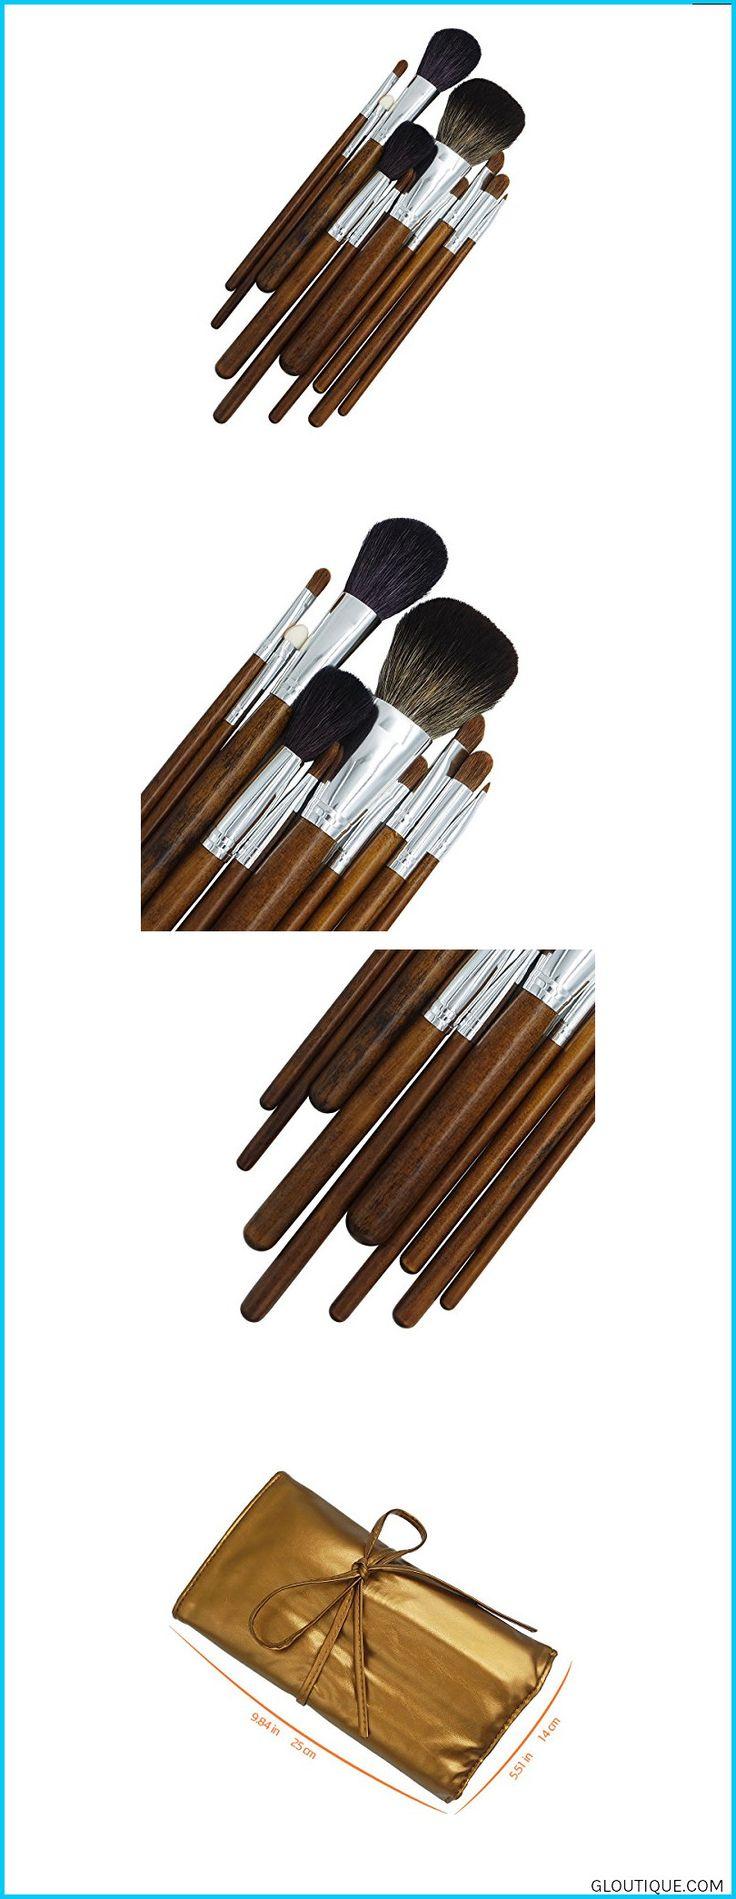 Beauty-Infinity-Professional-Cosmetic-Makeup-Brushes-Premium-Set-Natural-and-Synthetic-Foundation-Blending-Blush-Eyeliner-Face-Powder-Brush-Makeup-Brush-Kit-18pcs-Brown